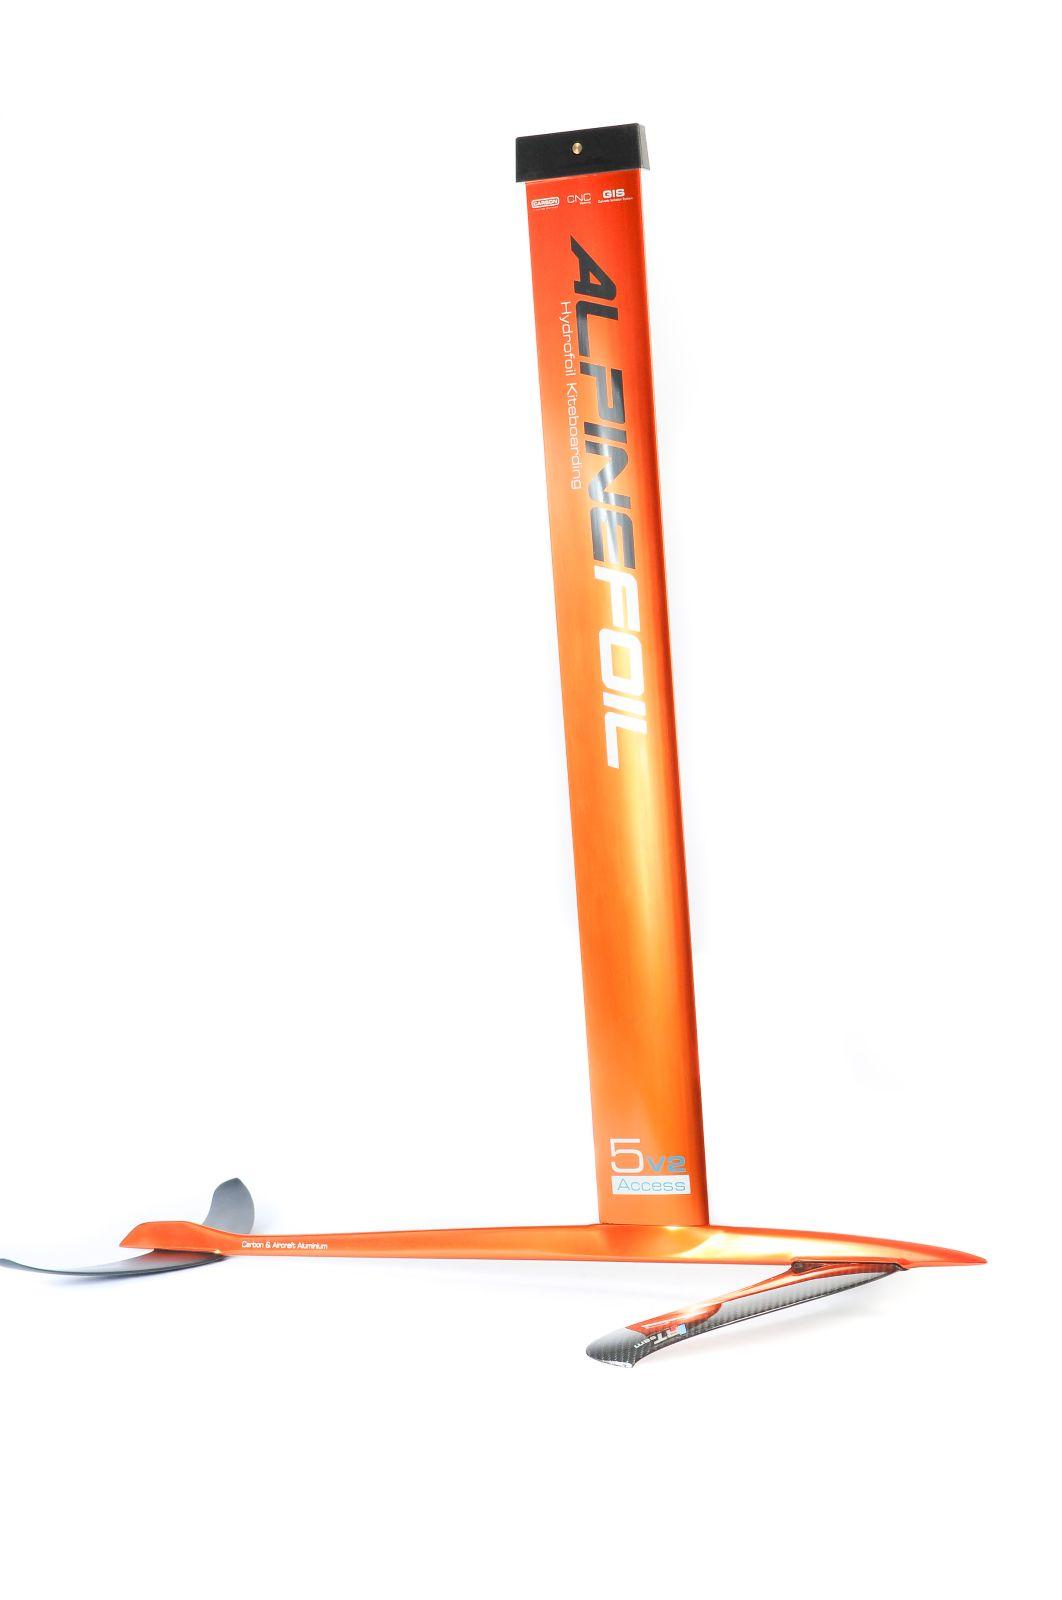 Kitefoil carbon aluminium alpinefoil 5 0 access v2 2515 1